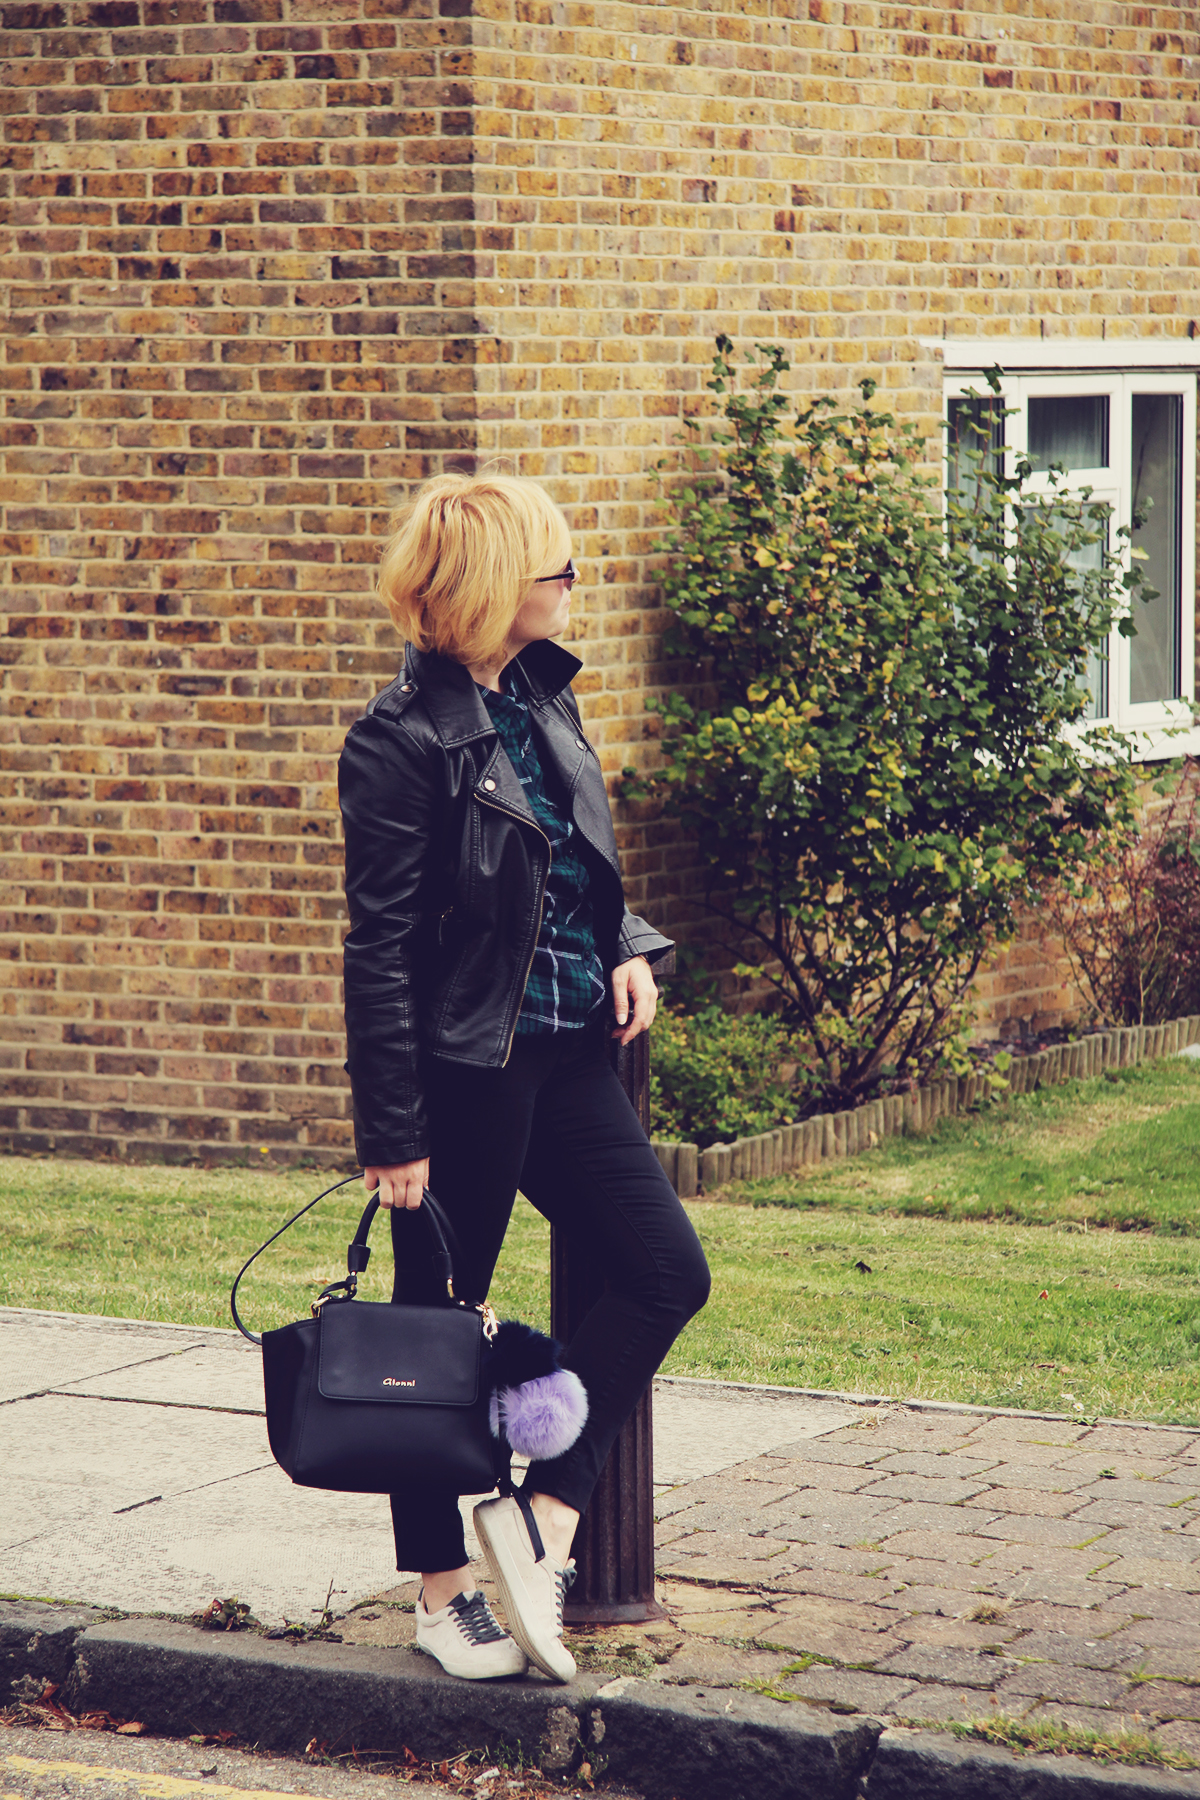 london-plimsolls-and-pom-poms